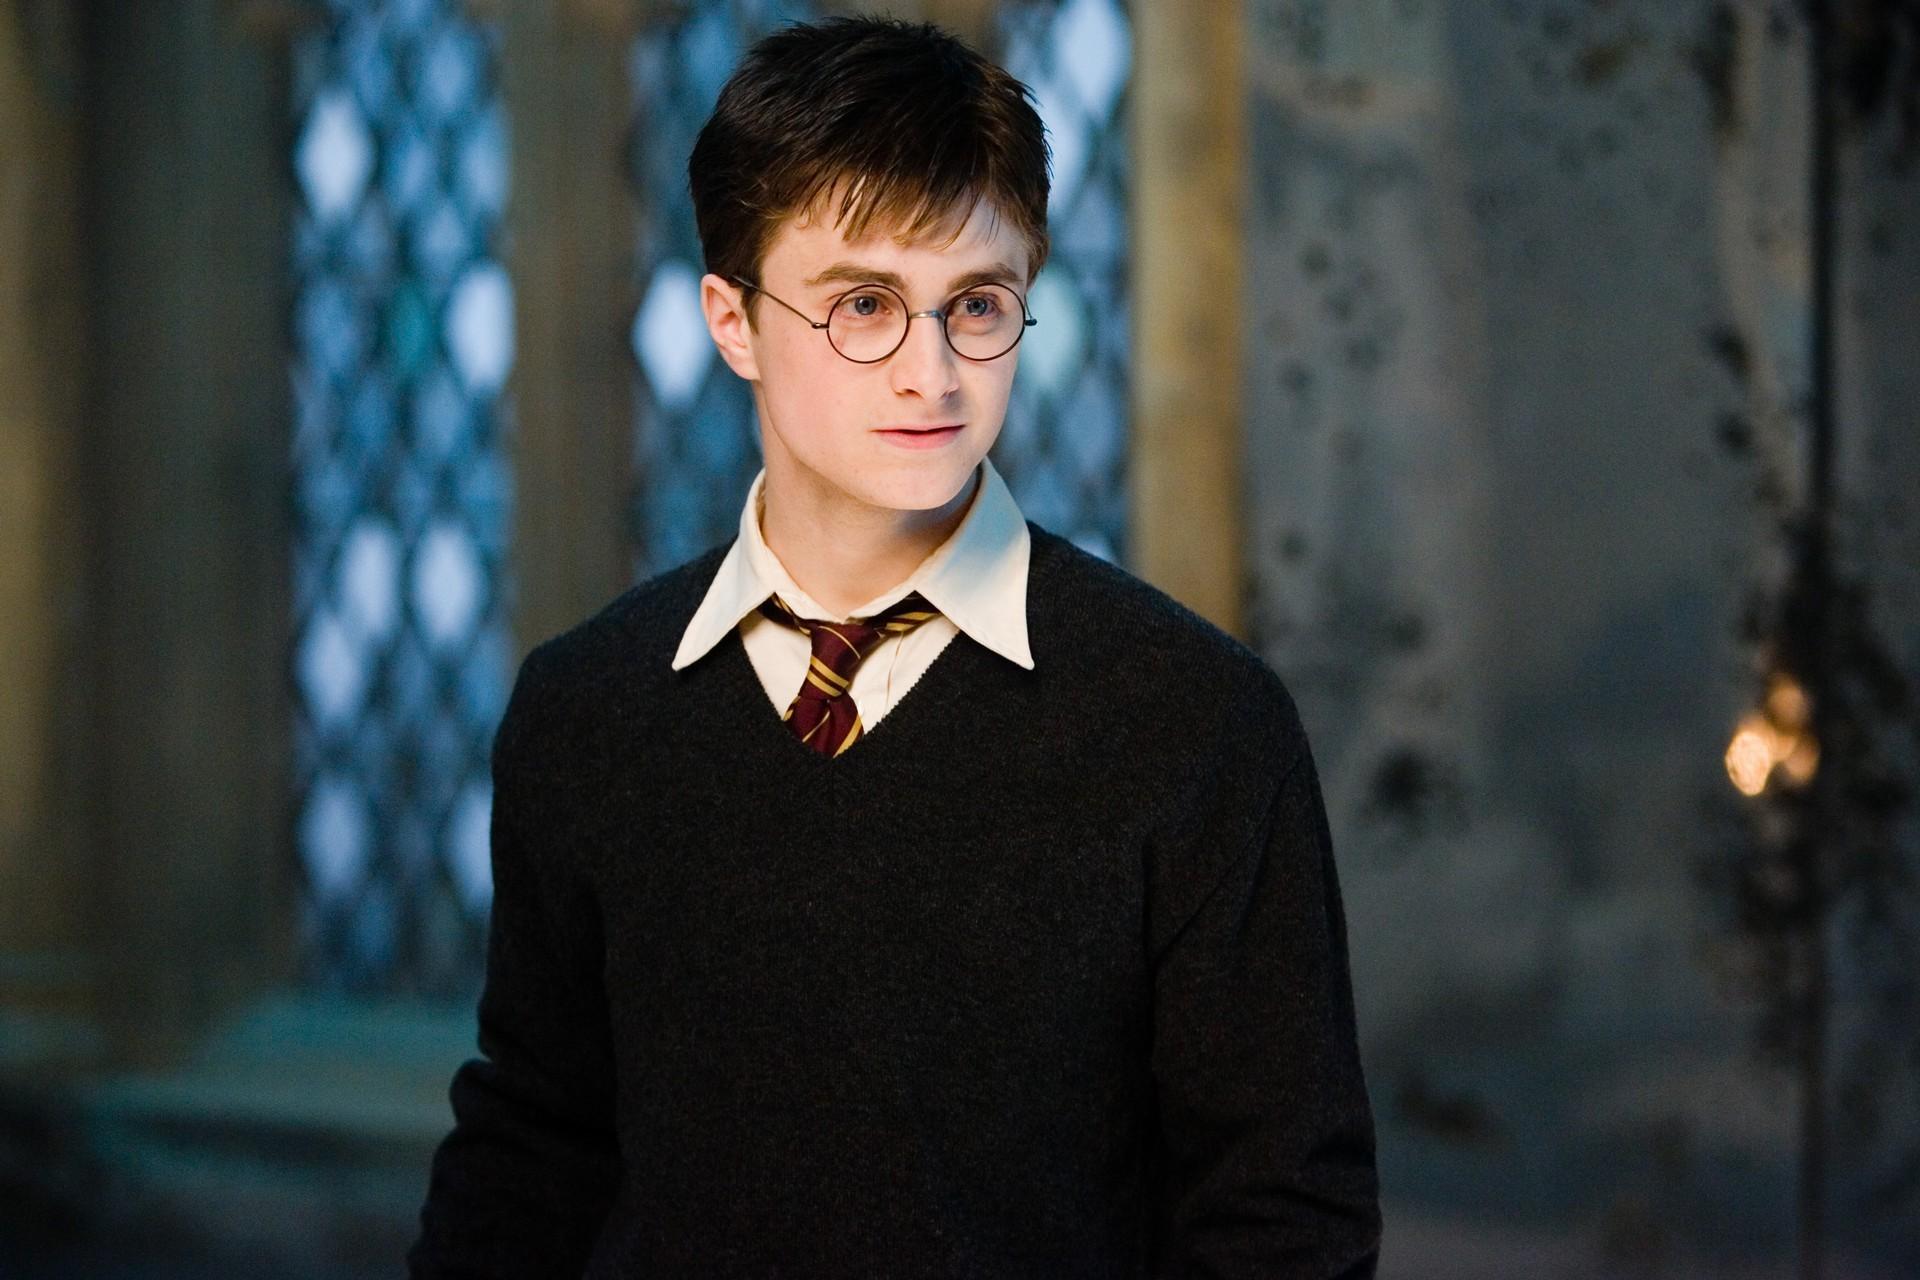 Harry Potter 39946 1920x1280 px  HDWallSourcecom